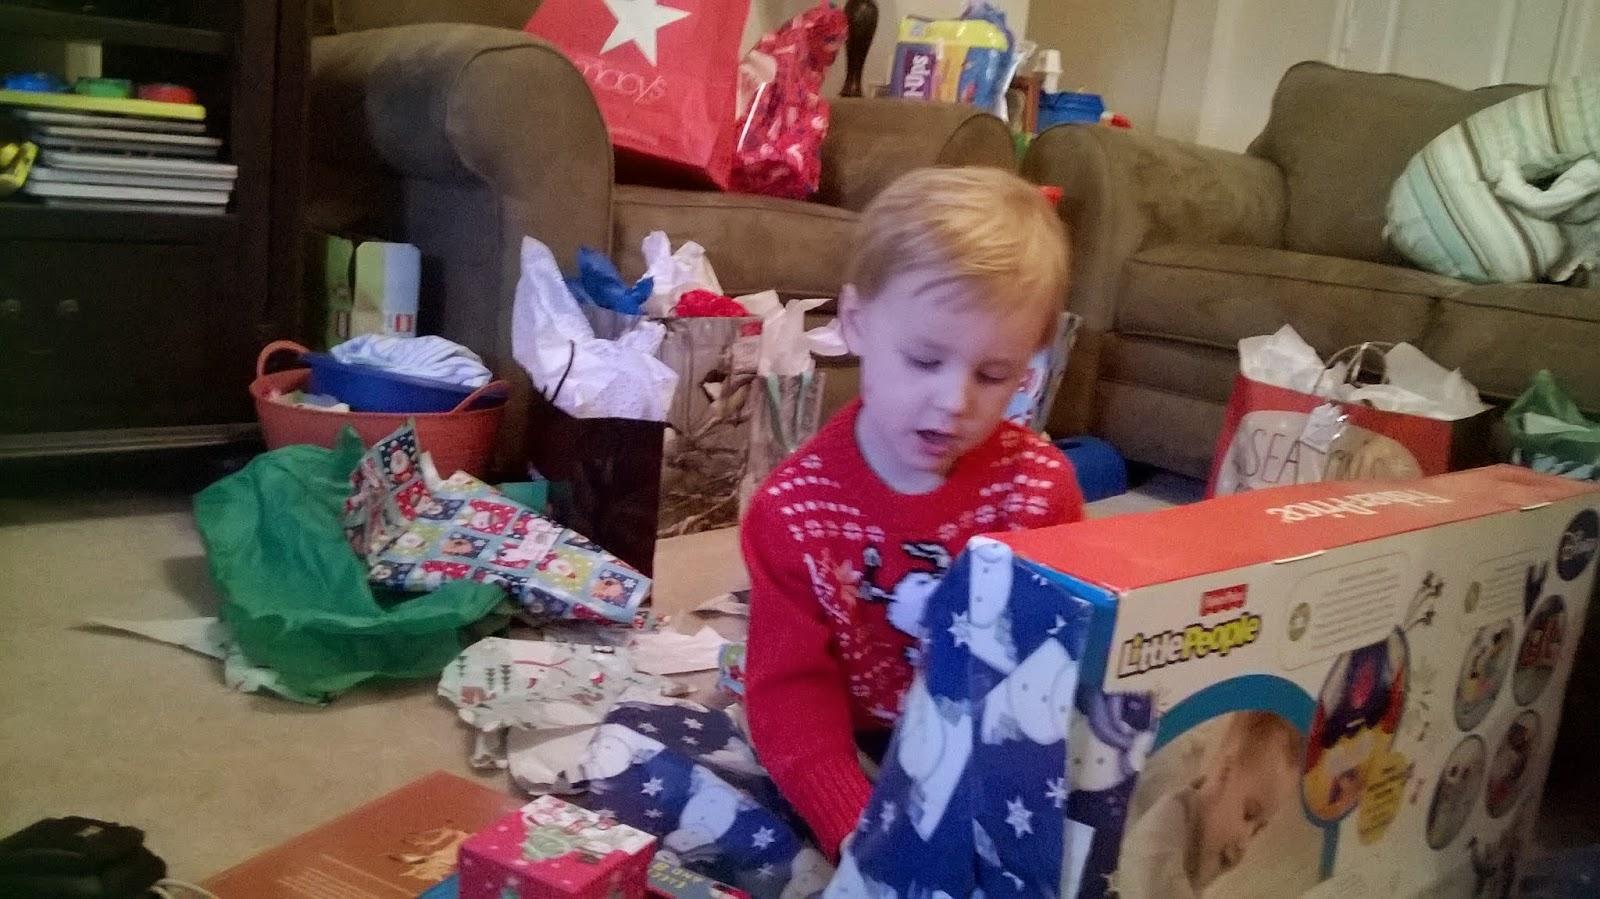 Christmas 2014 - WP_20141224_010%2B%25282%2529.jpg